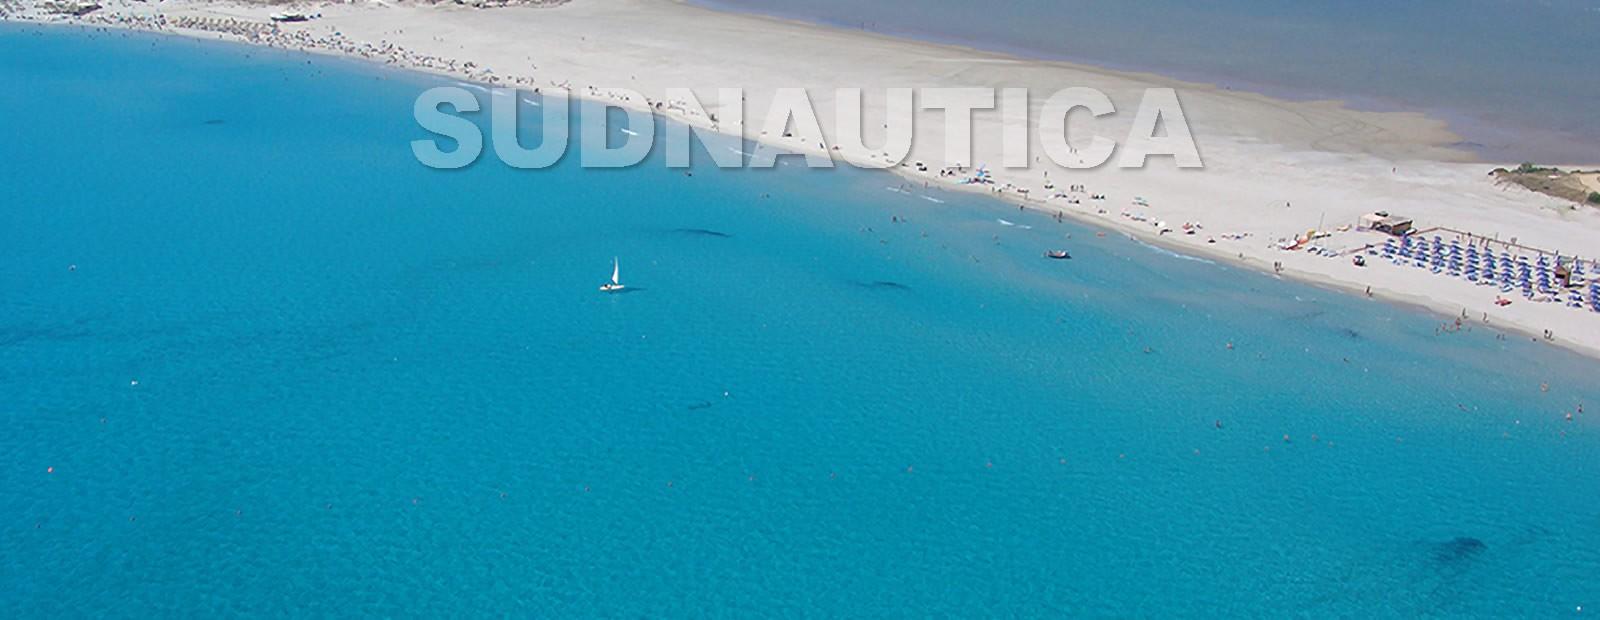 sudnautica3